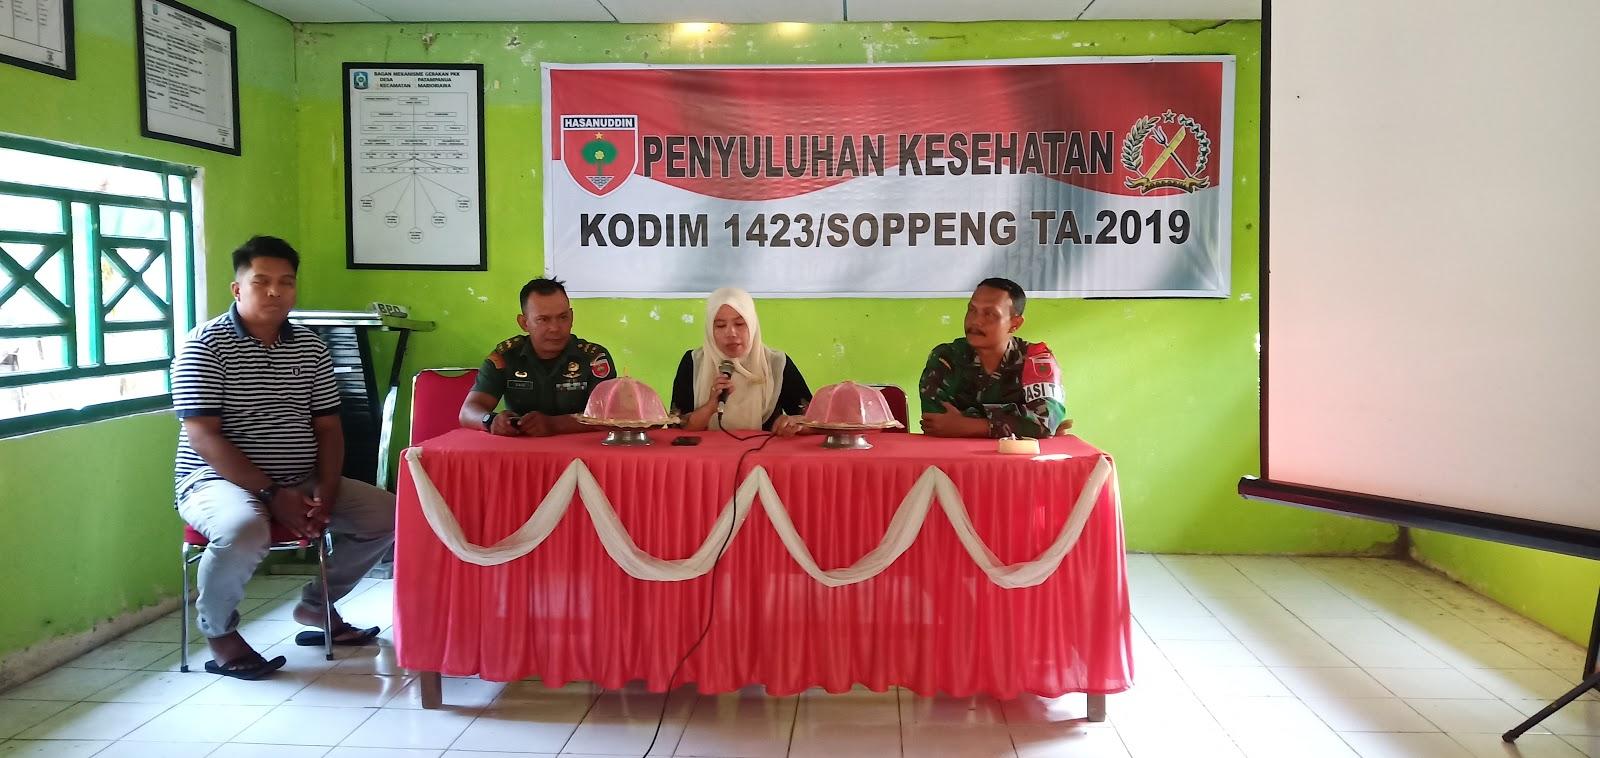 Satgas TMMD 106 Tahun 2019 Kodim 1423 Soppeng Gandeng Dinas KKBPK Gelar Kegiatan Penyuluhan KB